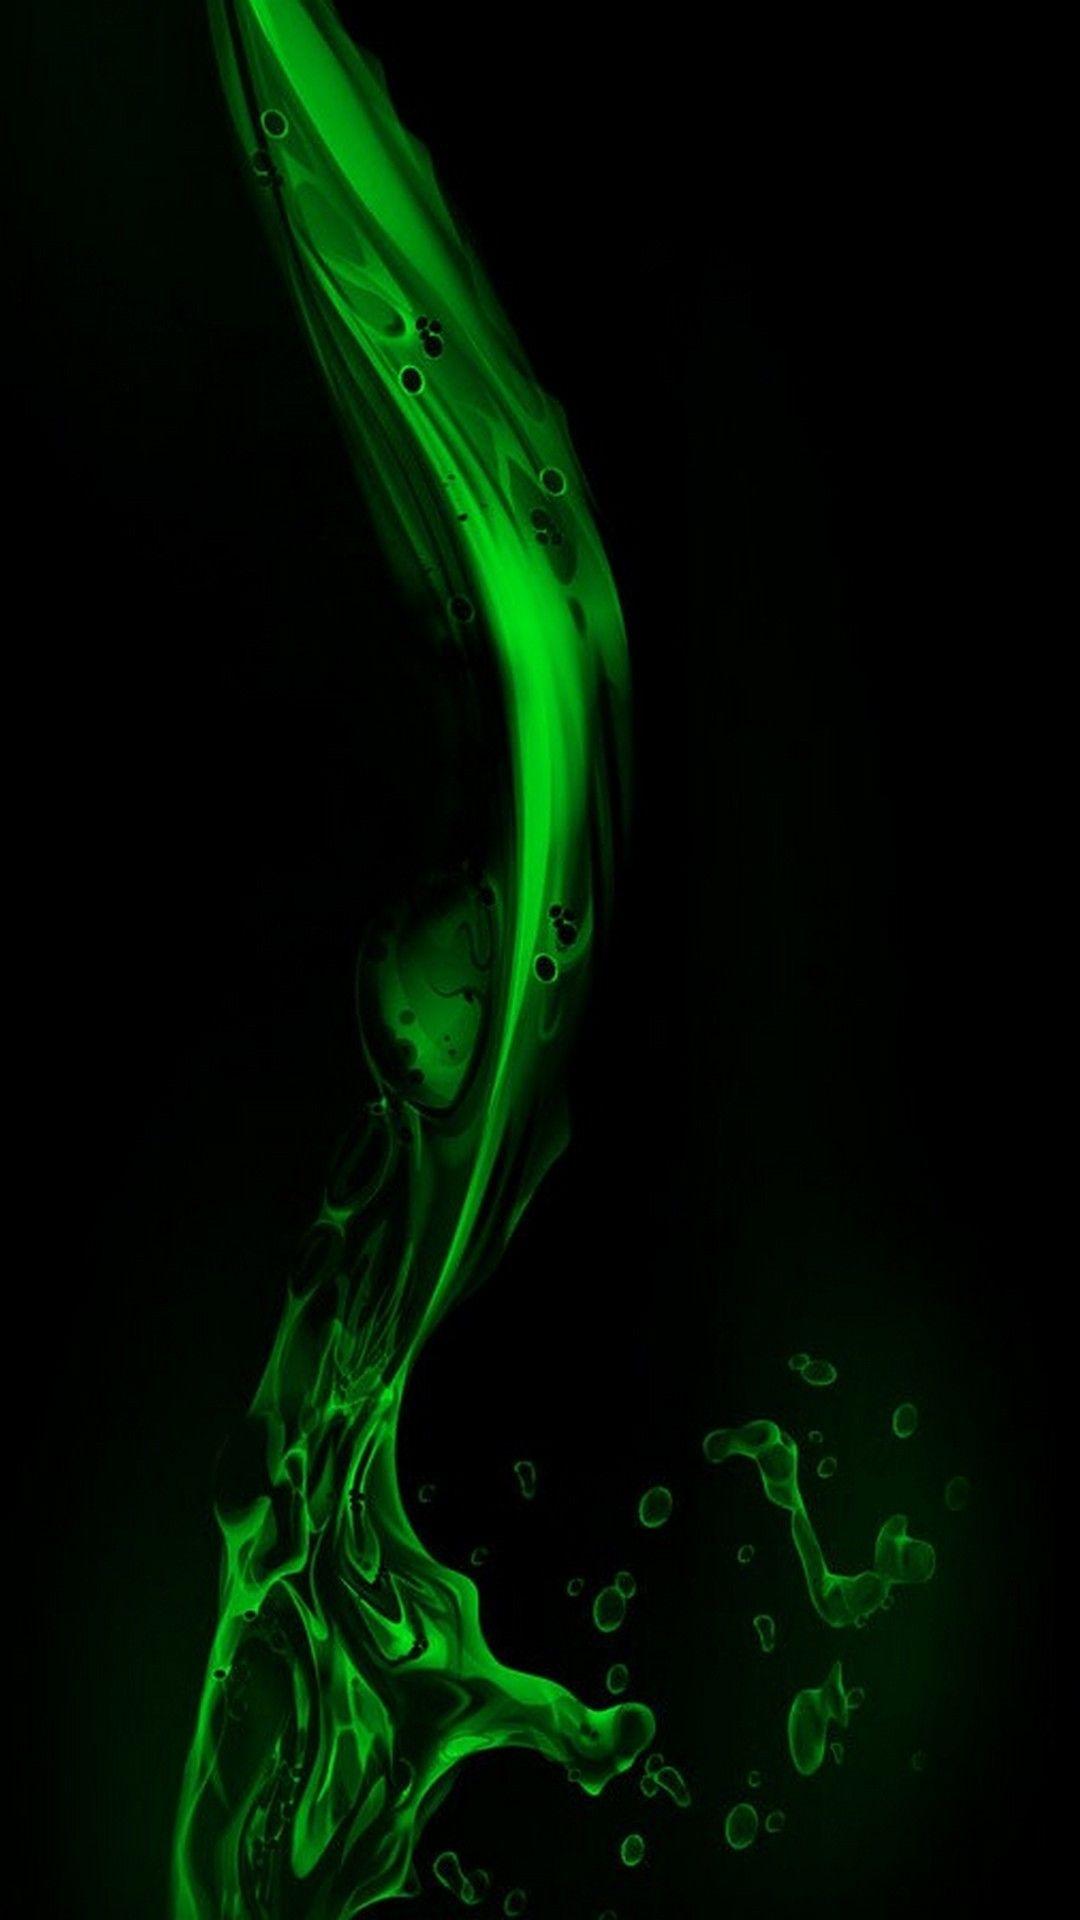 Green Liquid Wallpaper Iphone Iphone Wallpaper Computer